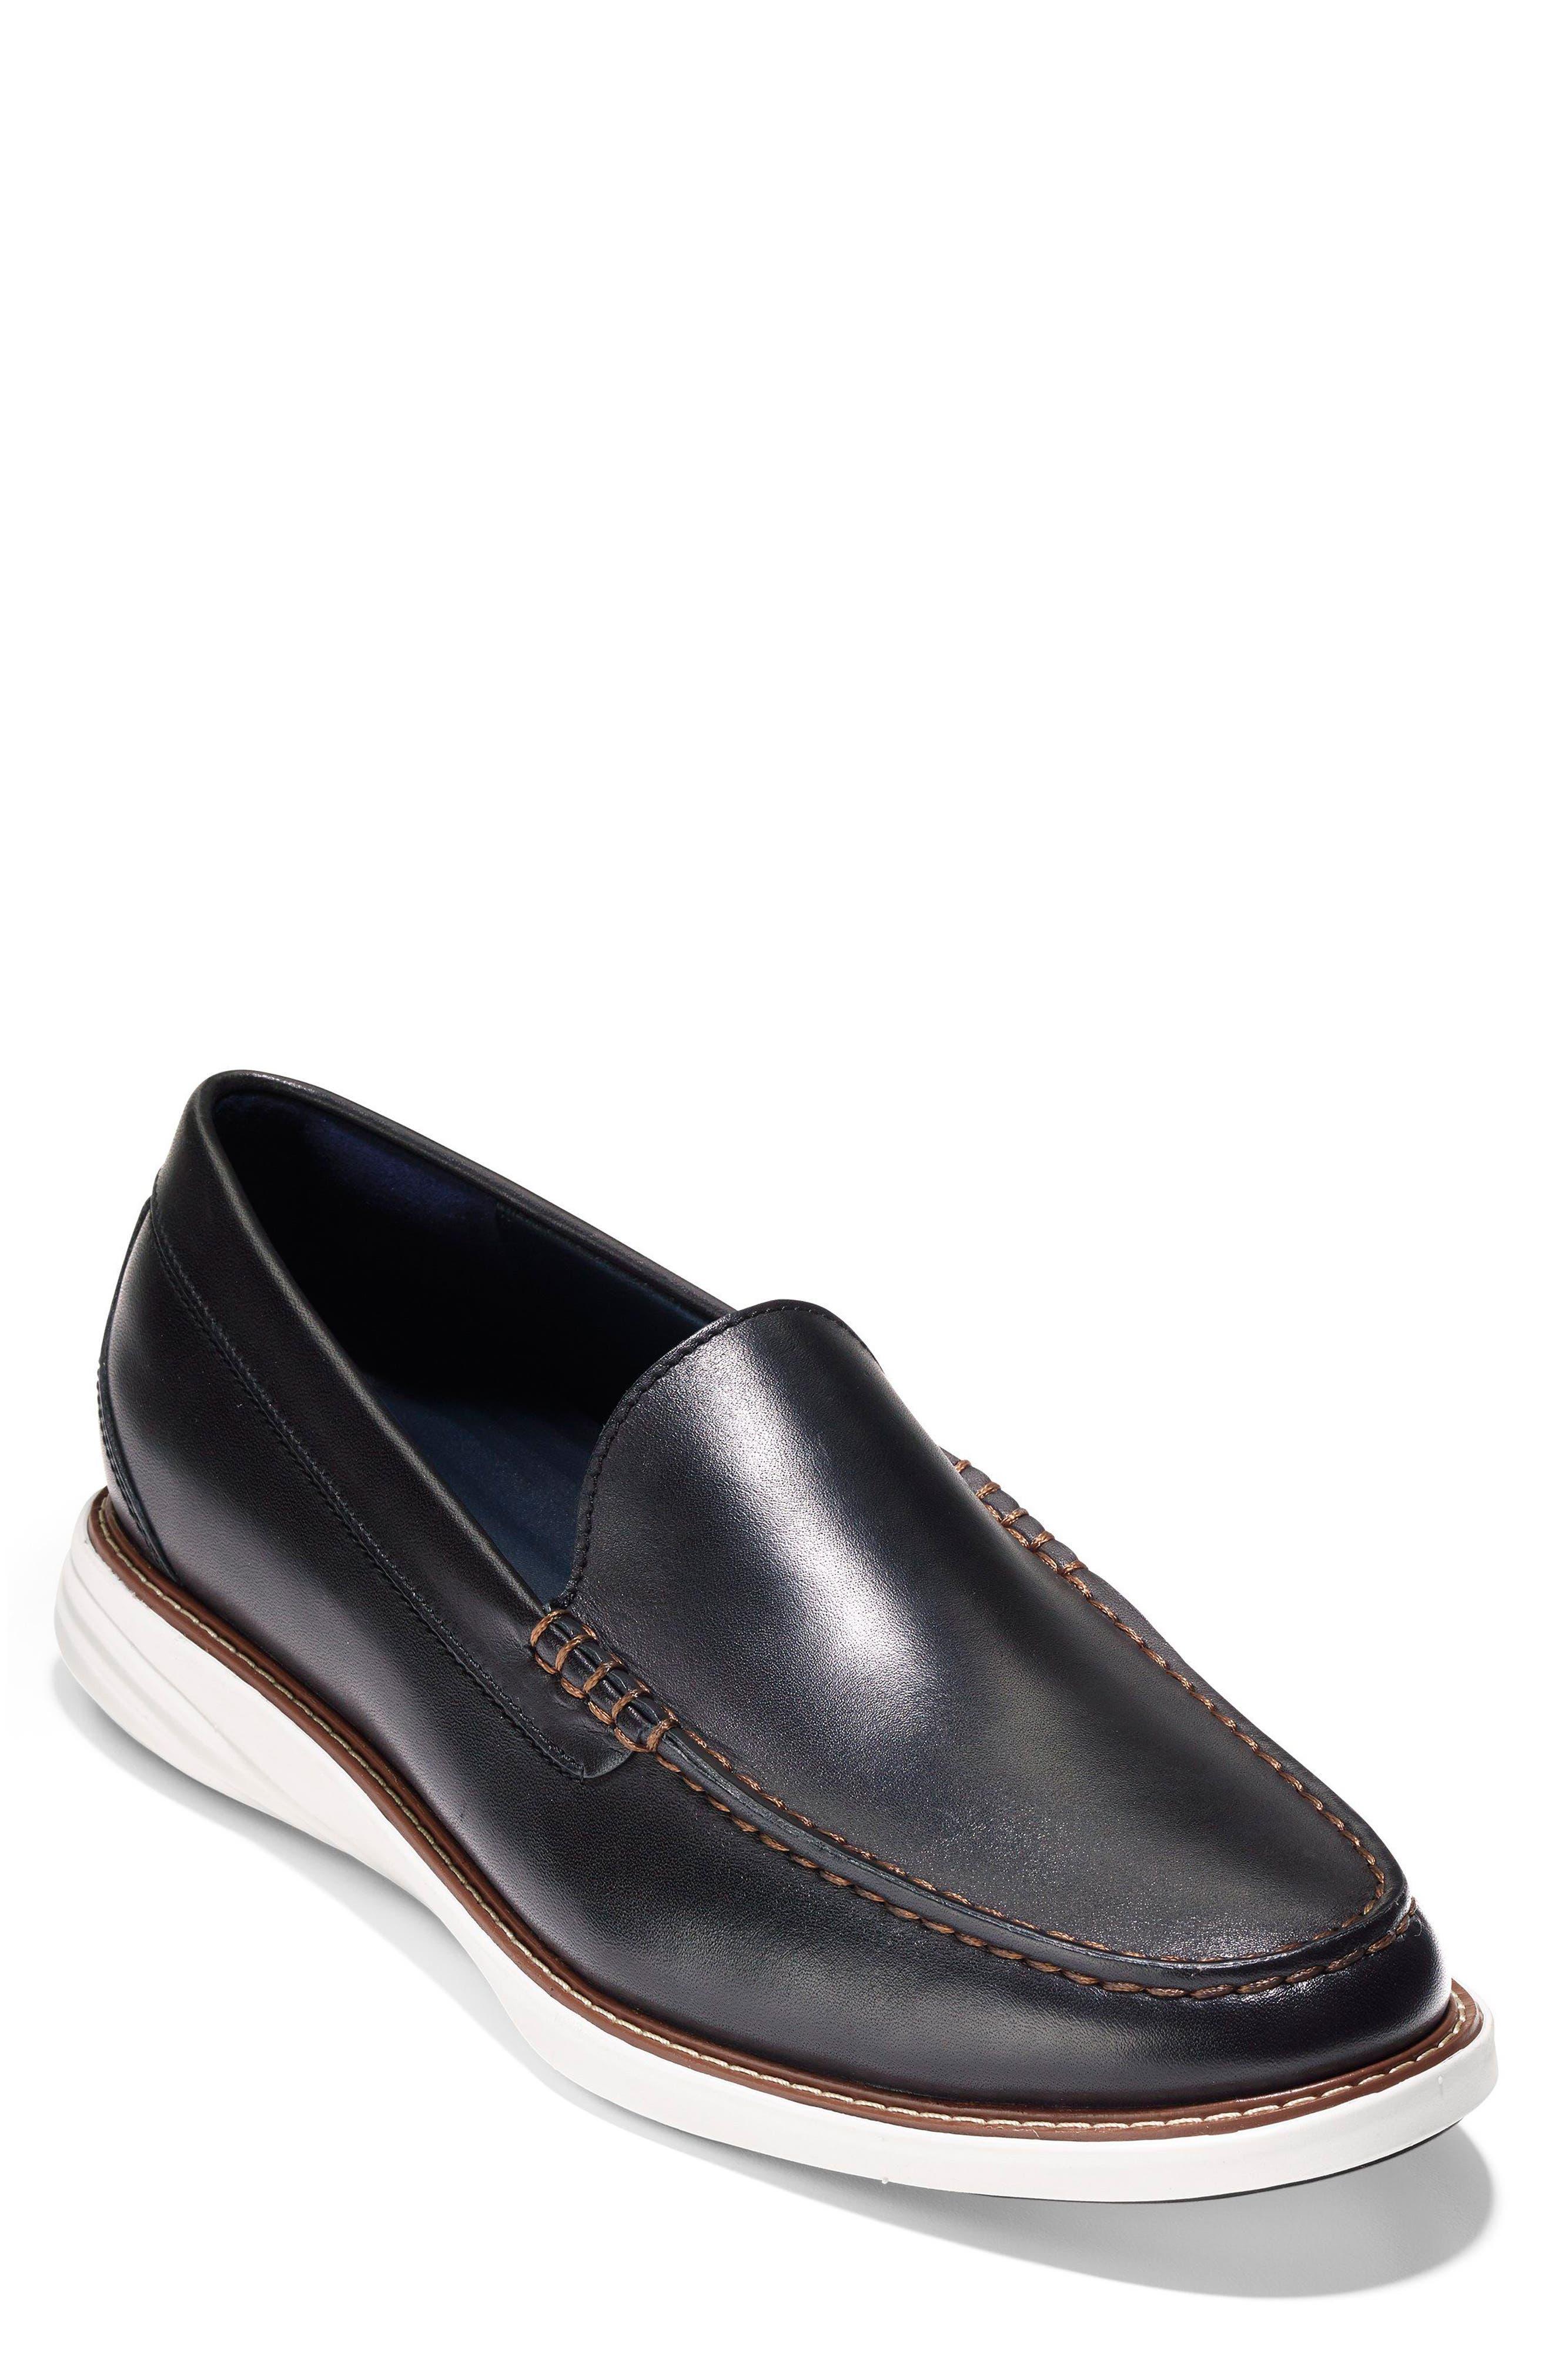 COLE HAAN GrandEvølution Venetian Loafer, Main, color, 001